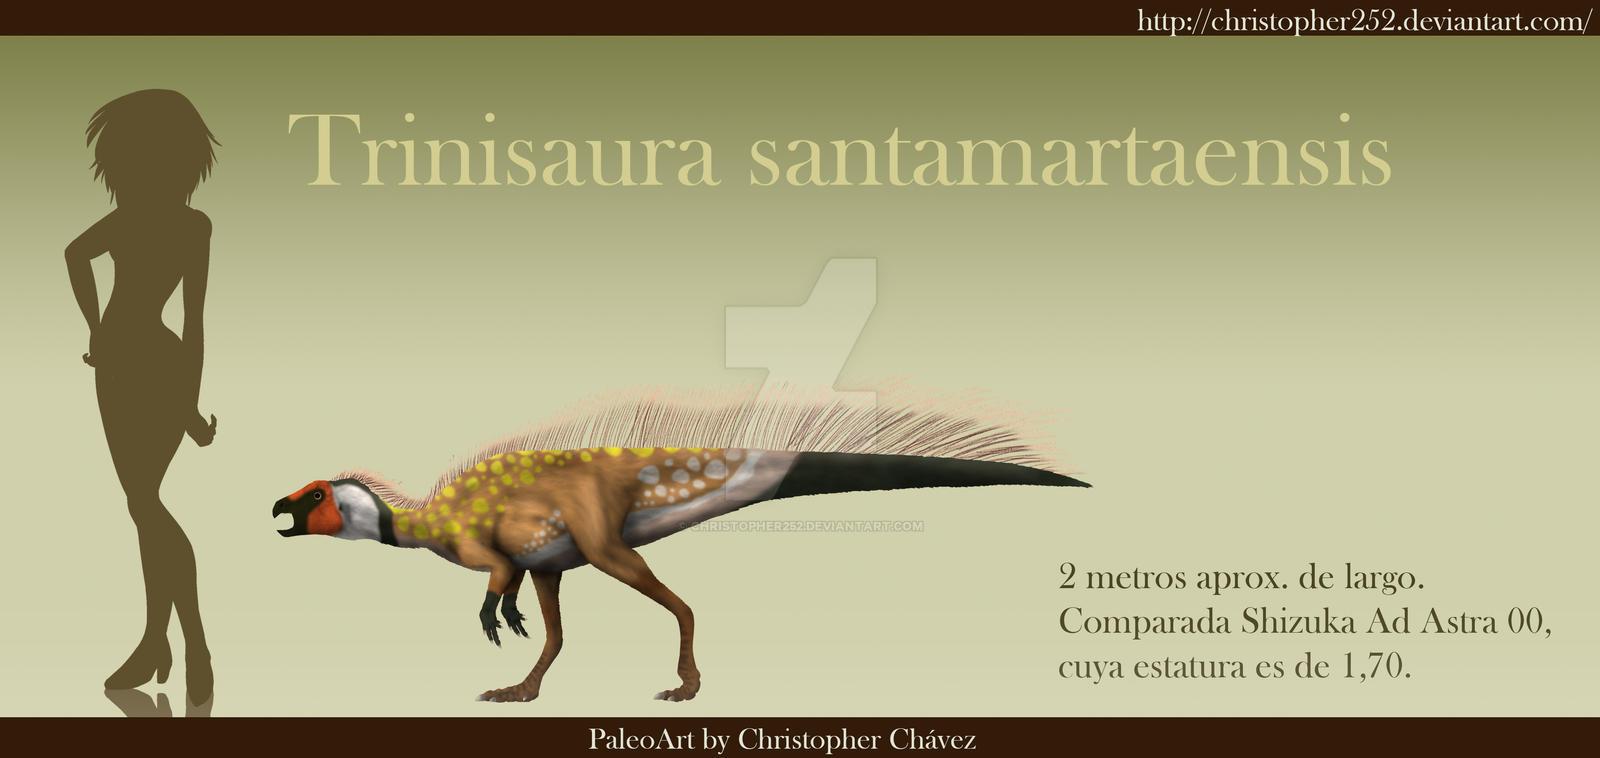 Trinisaura santamartaensis by Christopher252